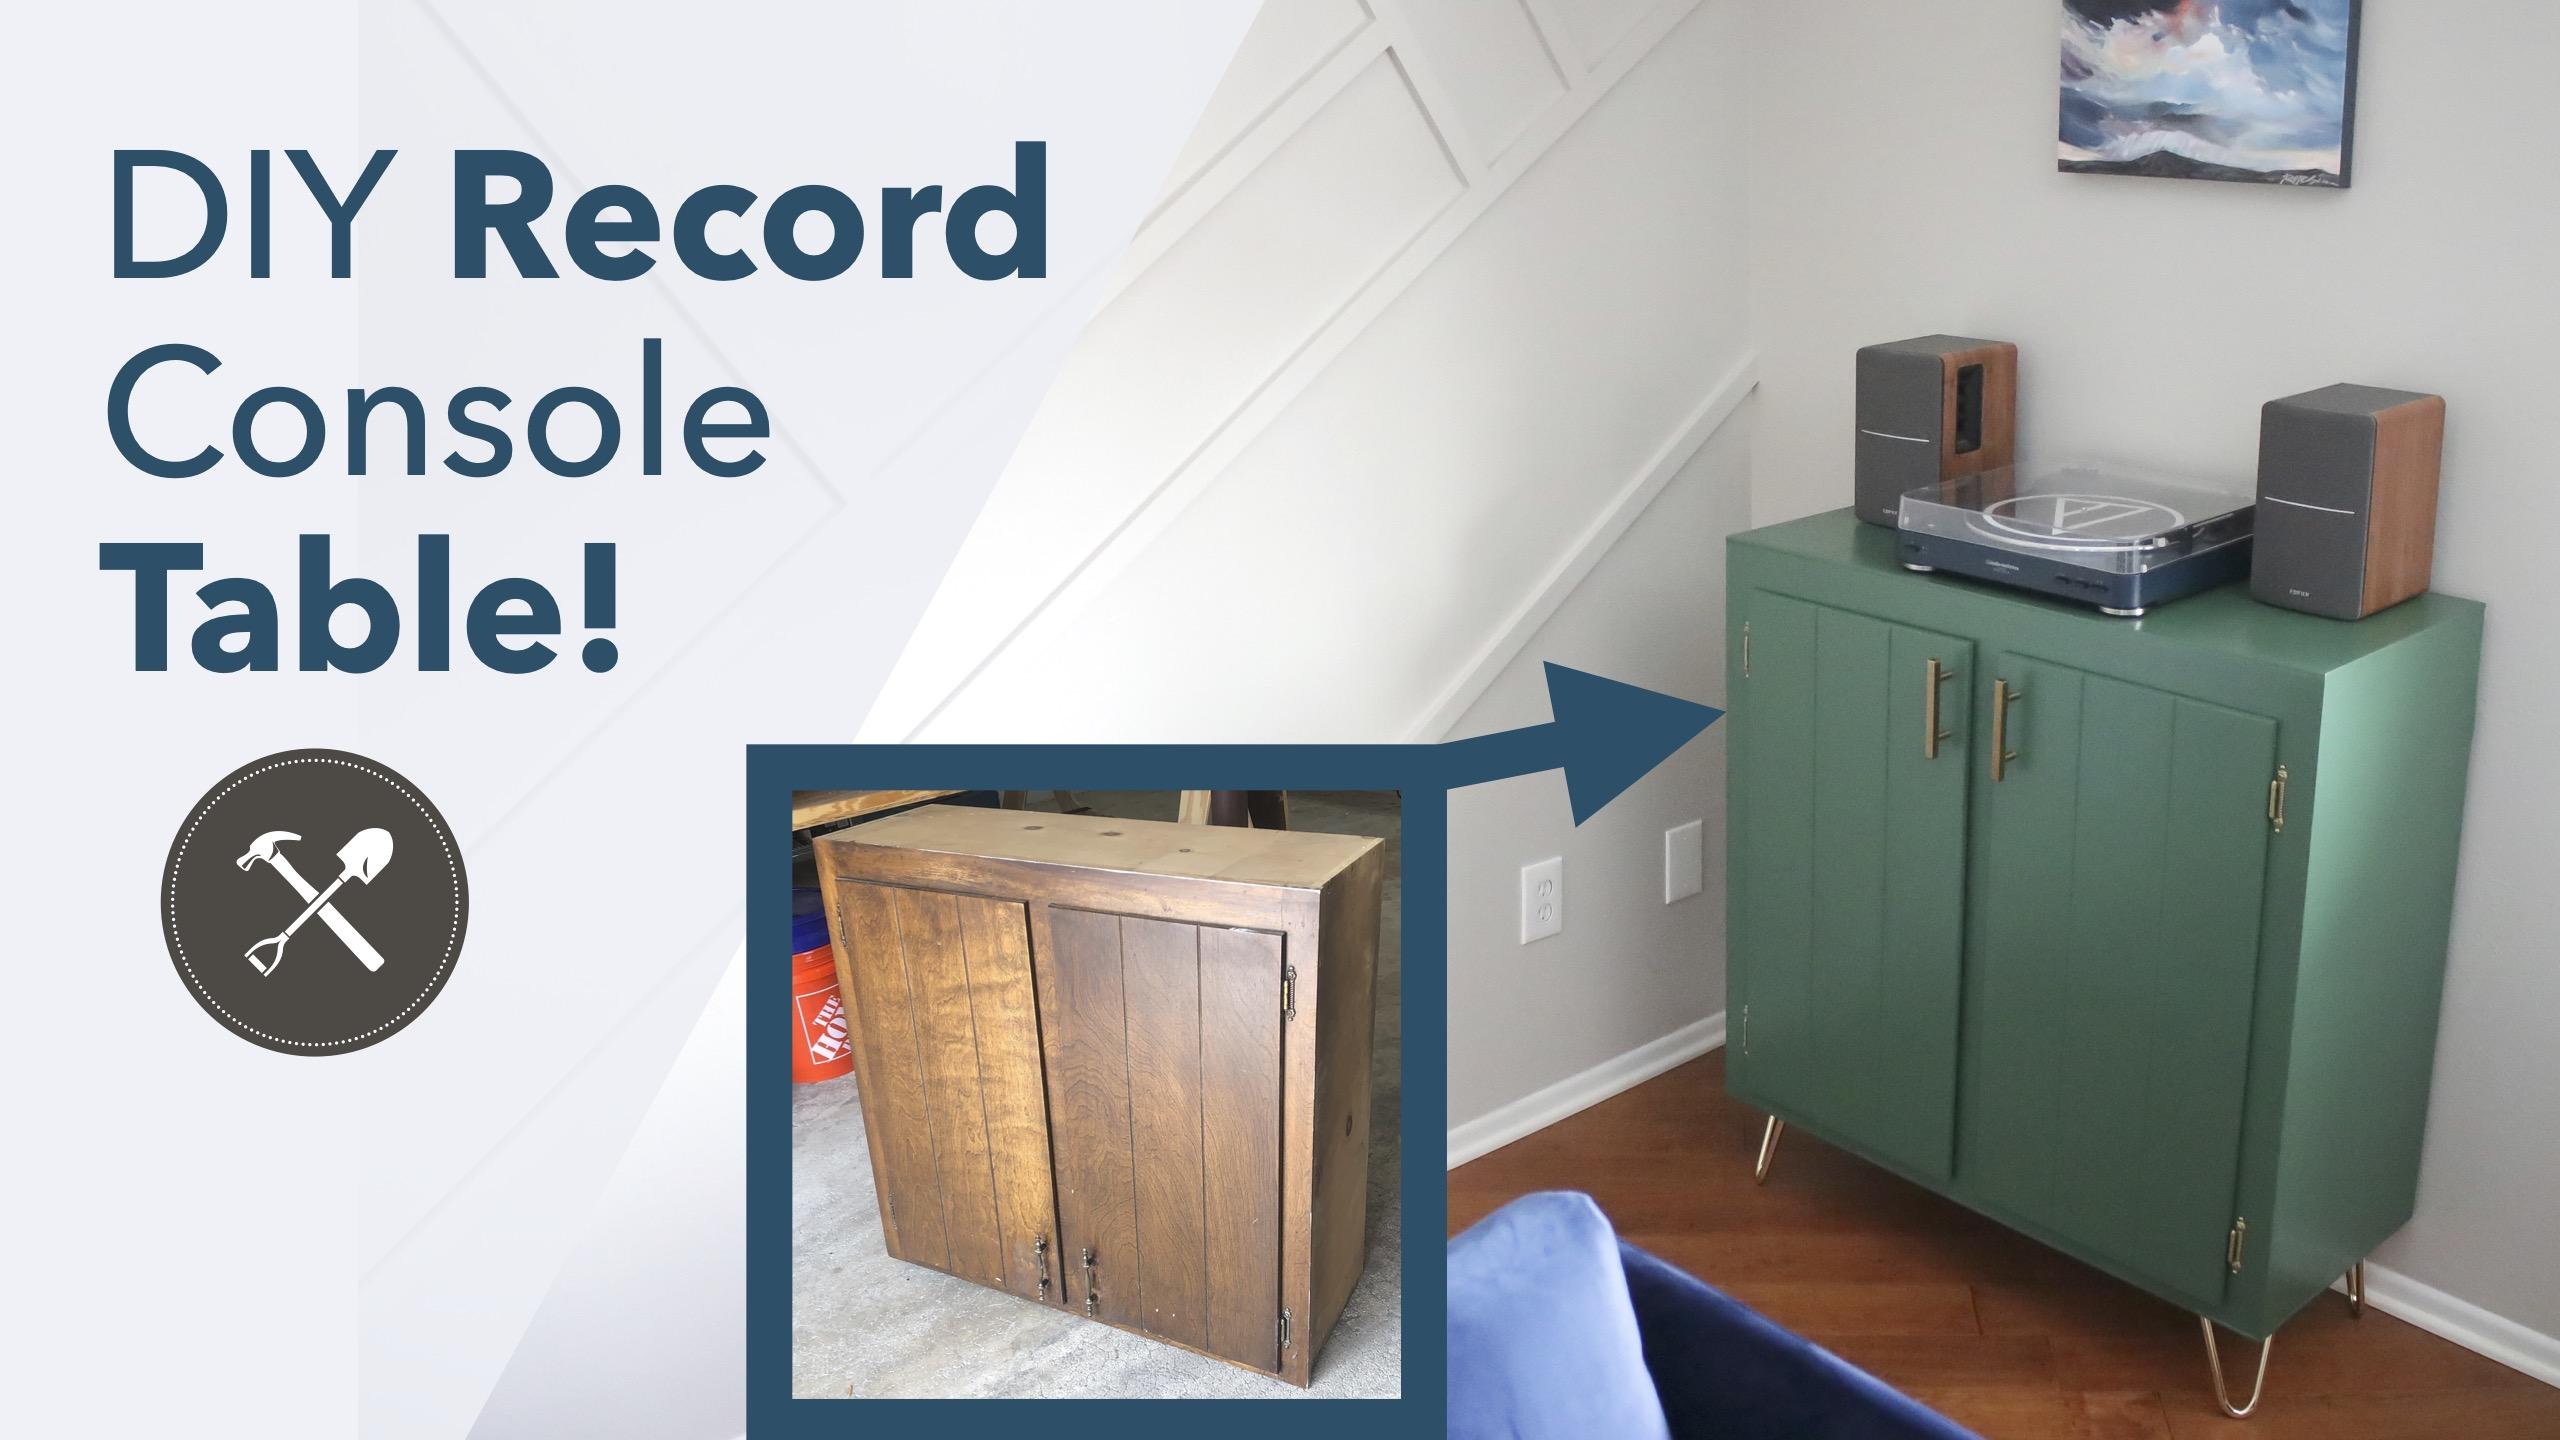 DIY Record Console Table